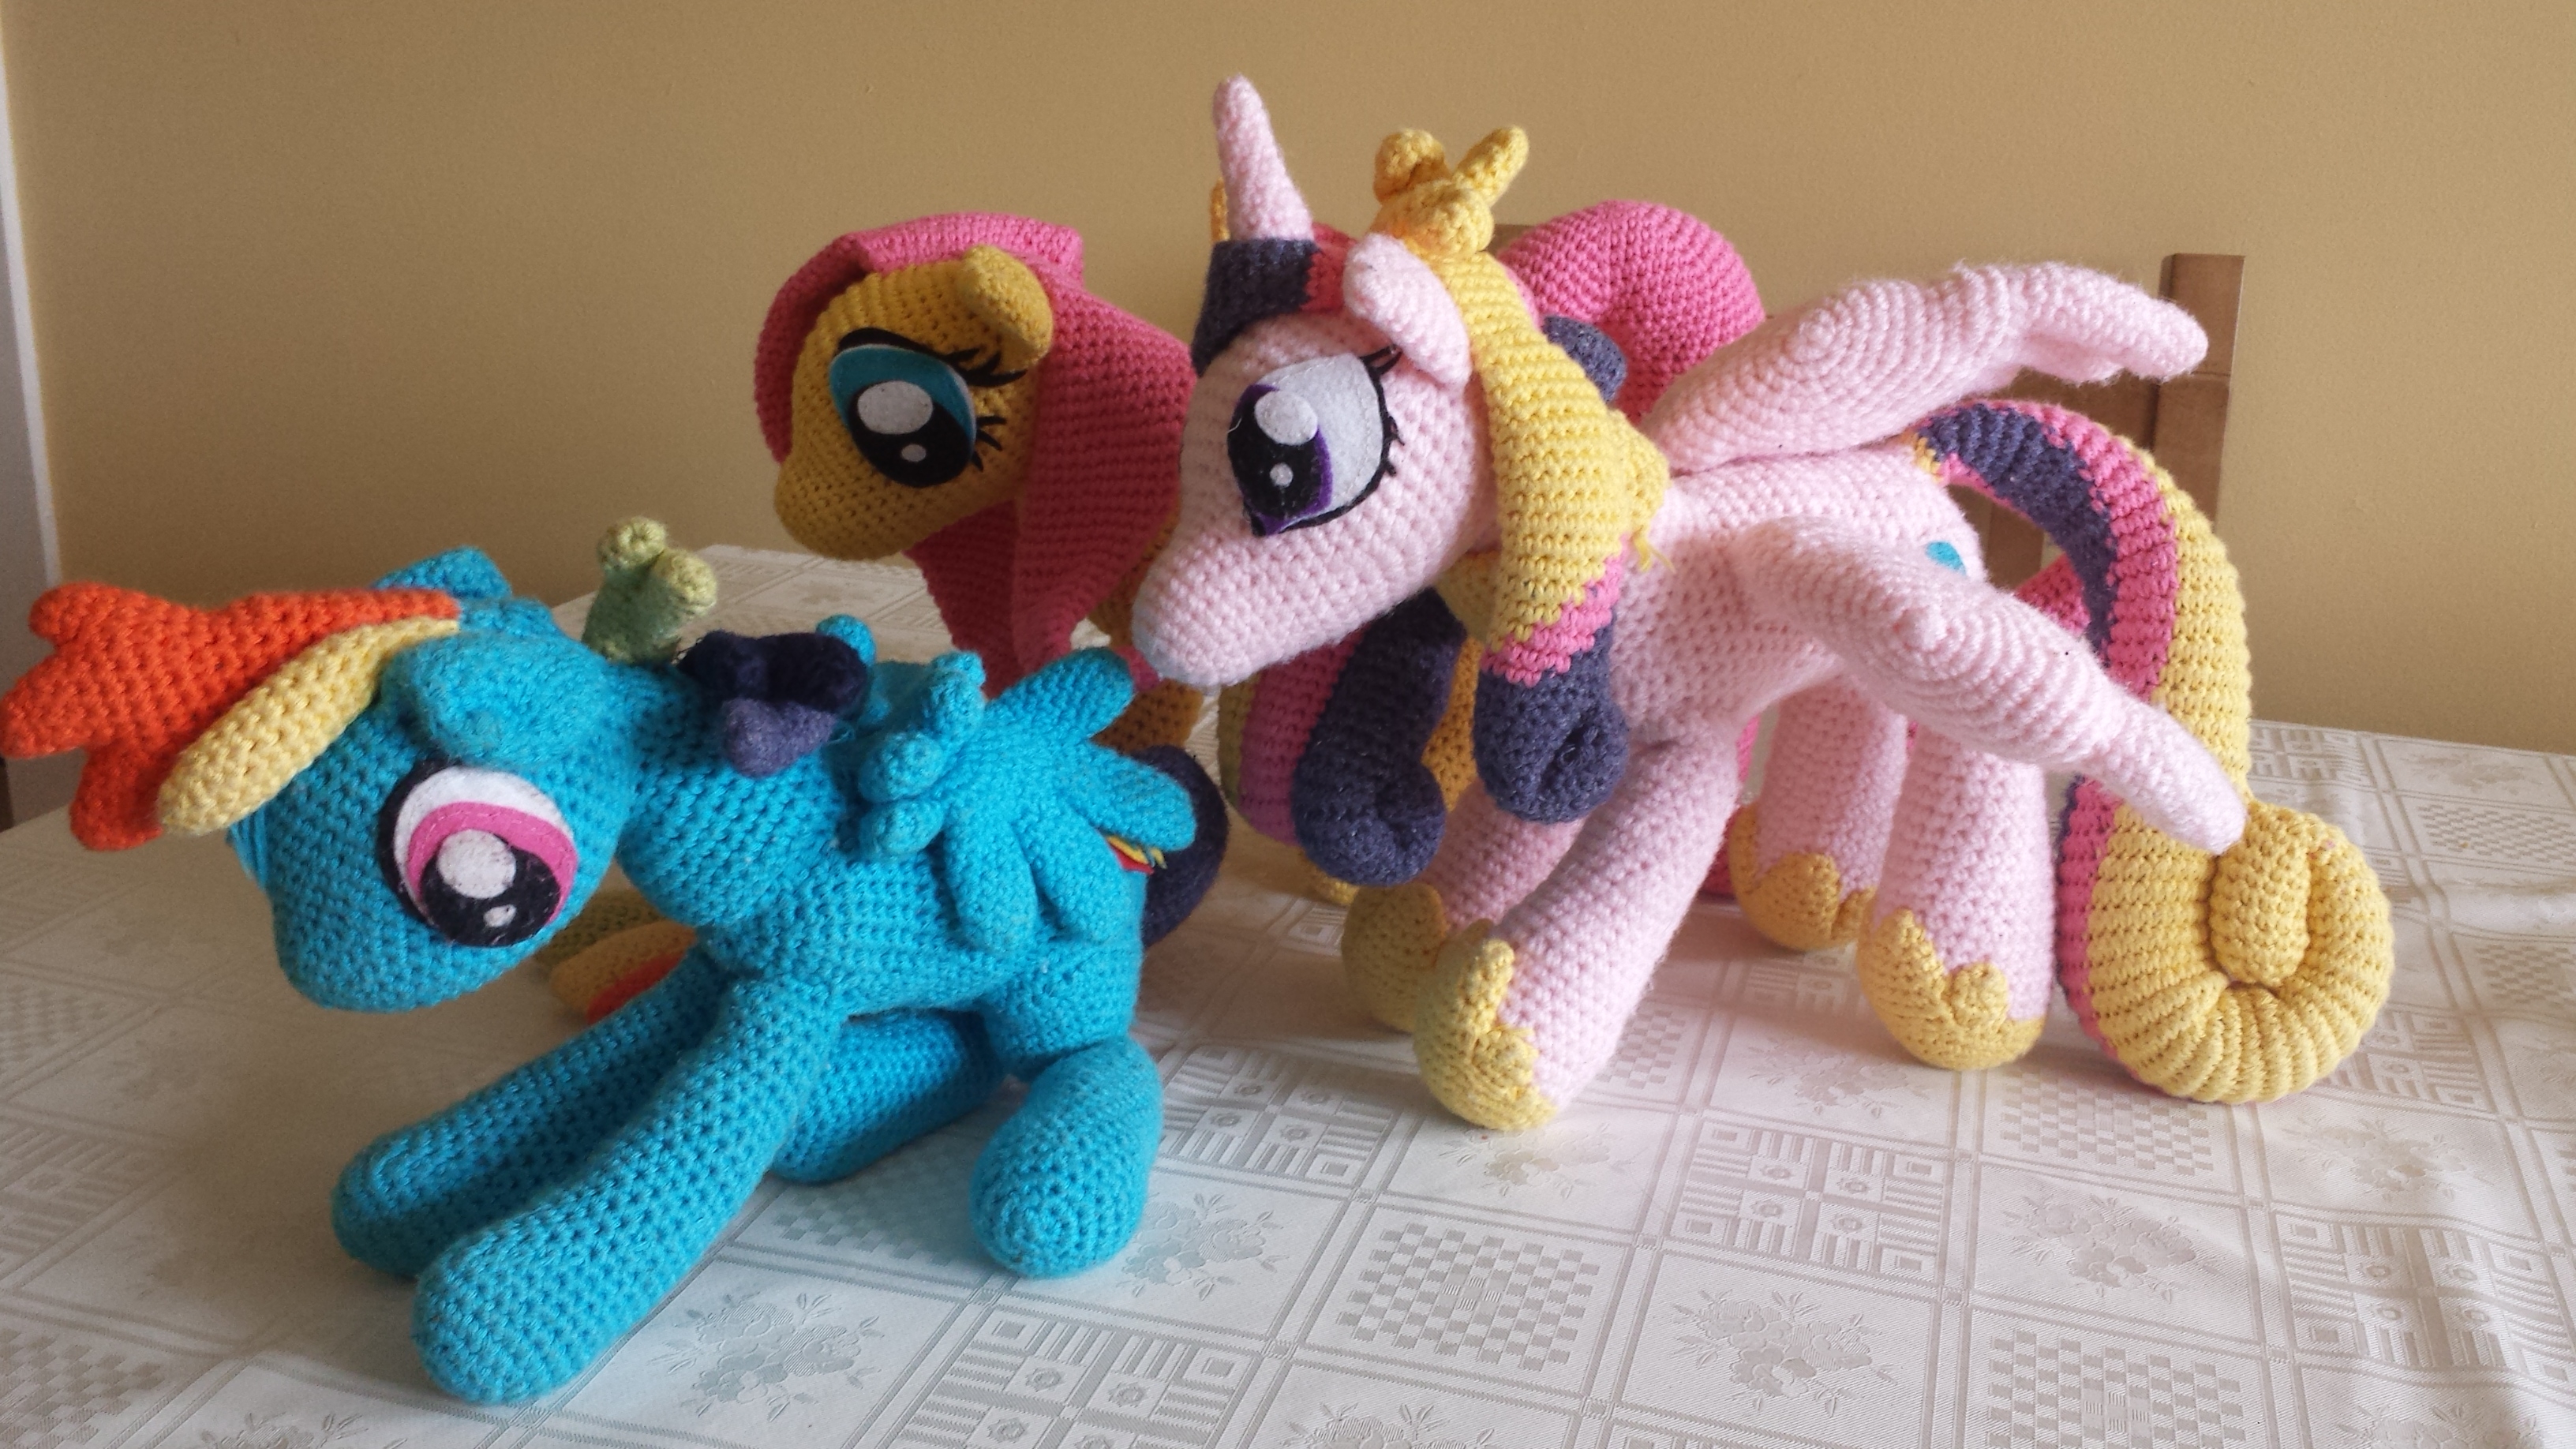 My Little Pony Toy Crochet Pattern | Crochet pony, Crochet animal ... | 1836x3264